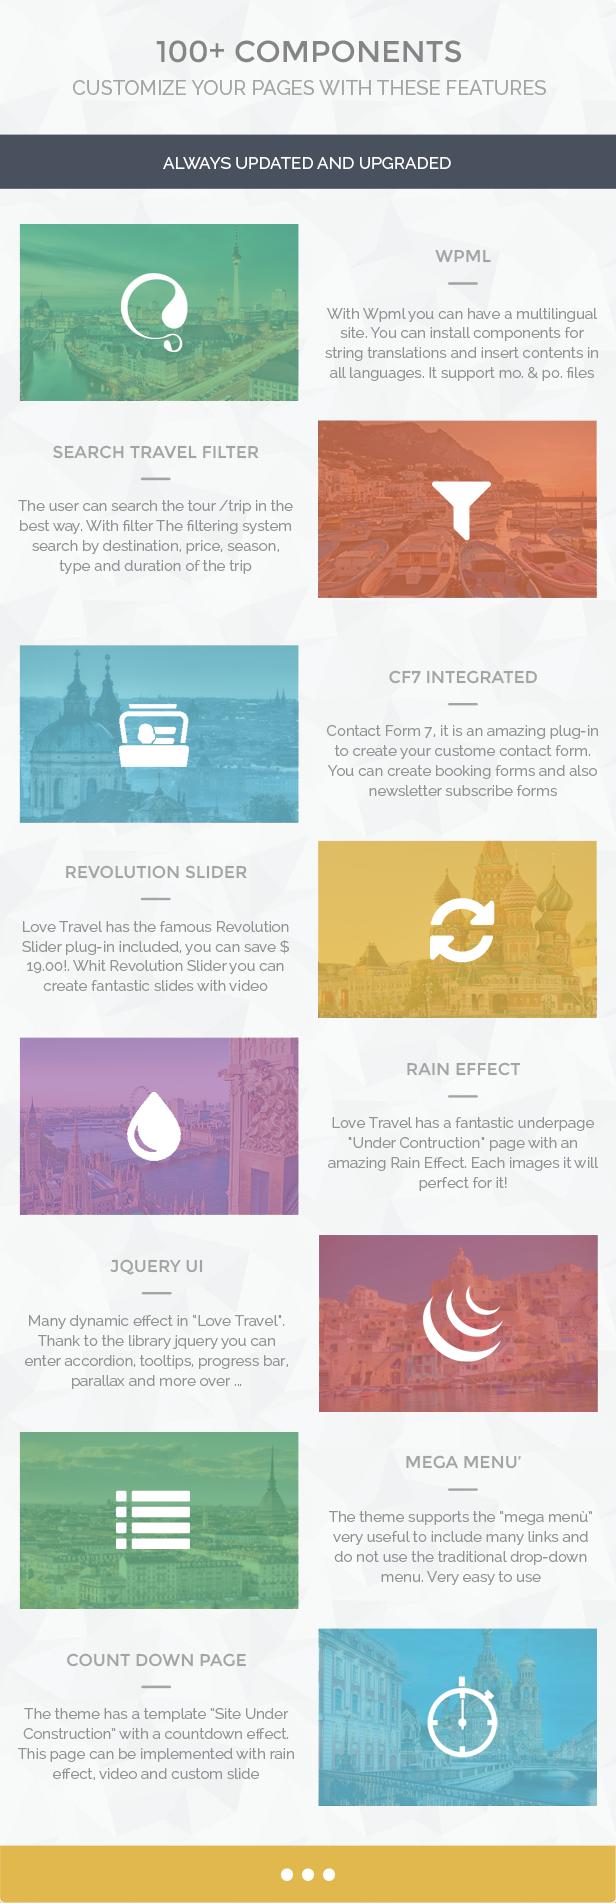 love7 - Love Travel - Creative Travel Agency WordPress